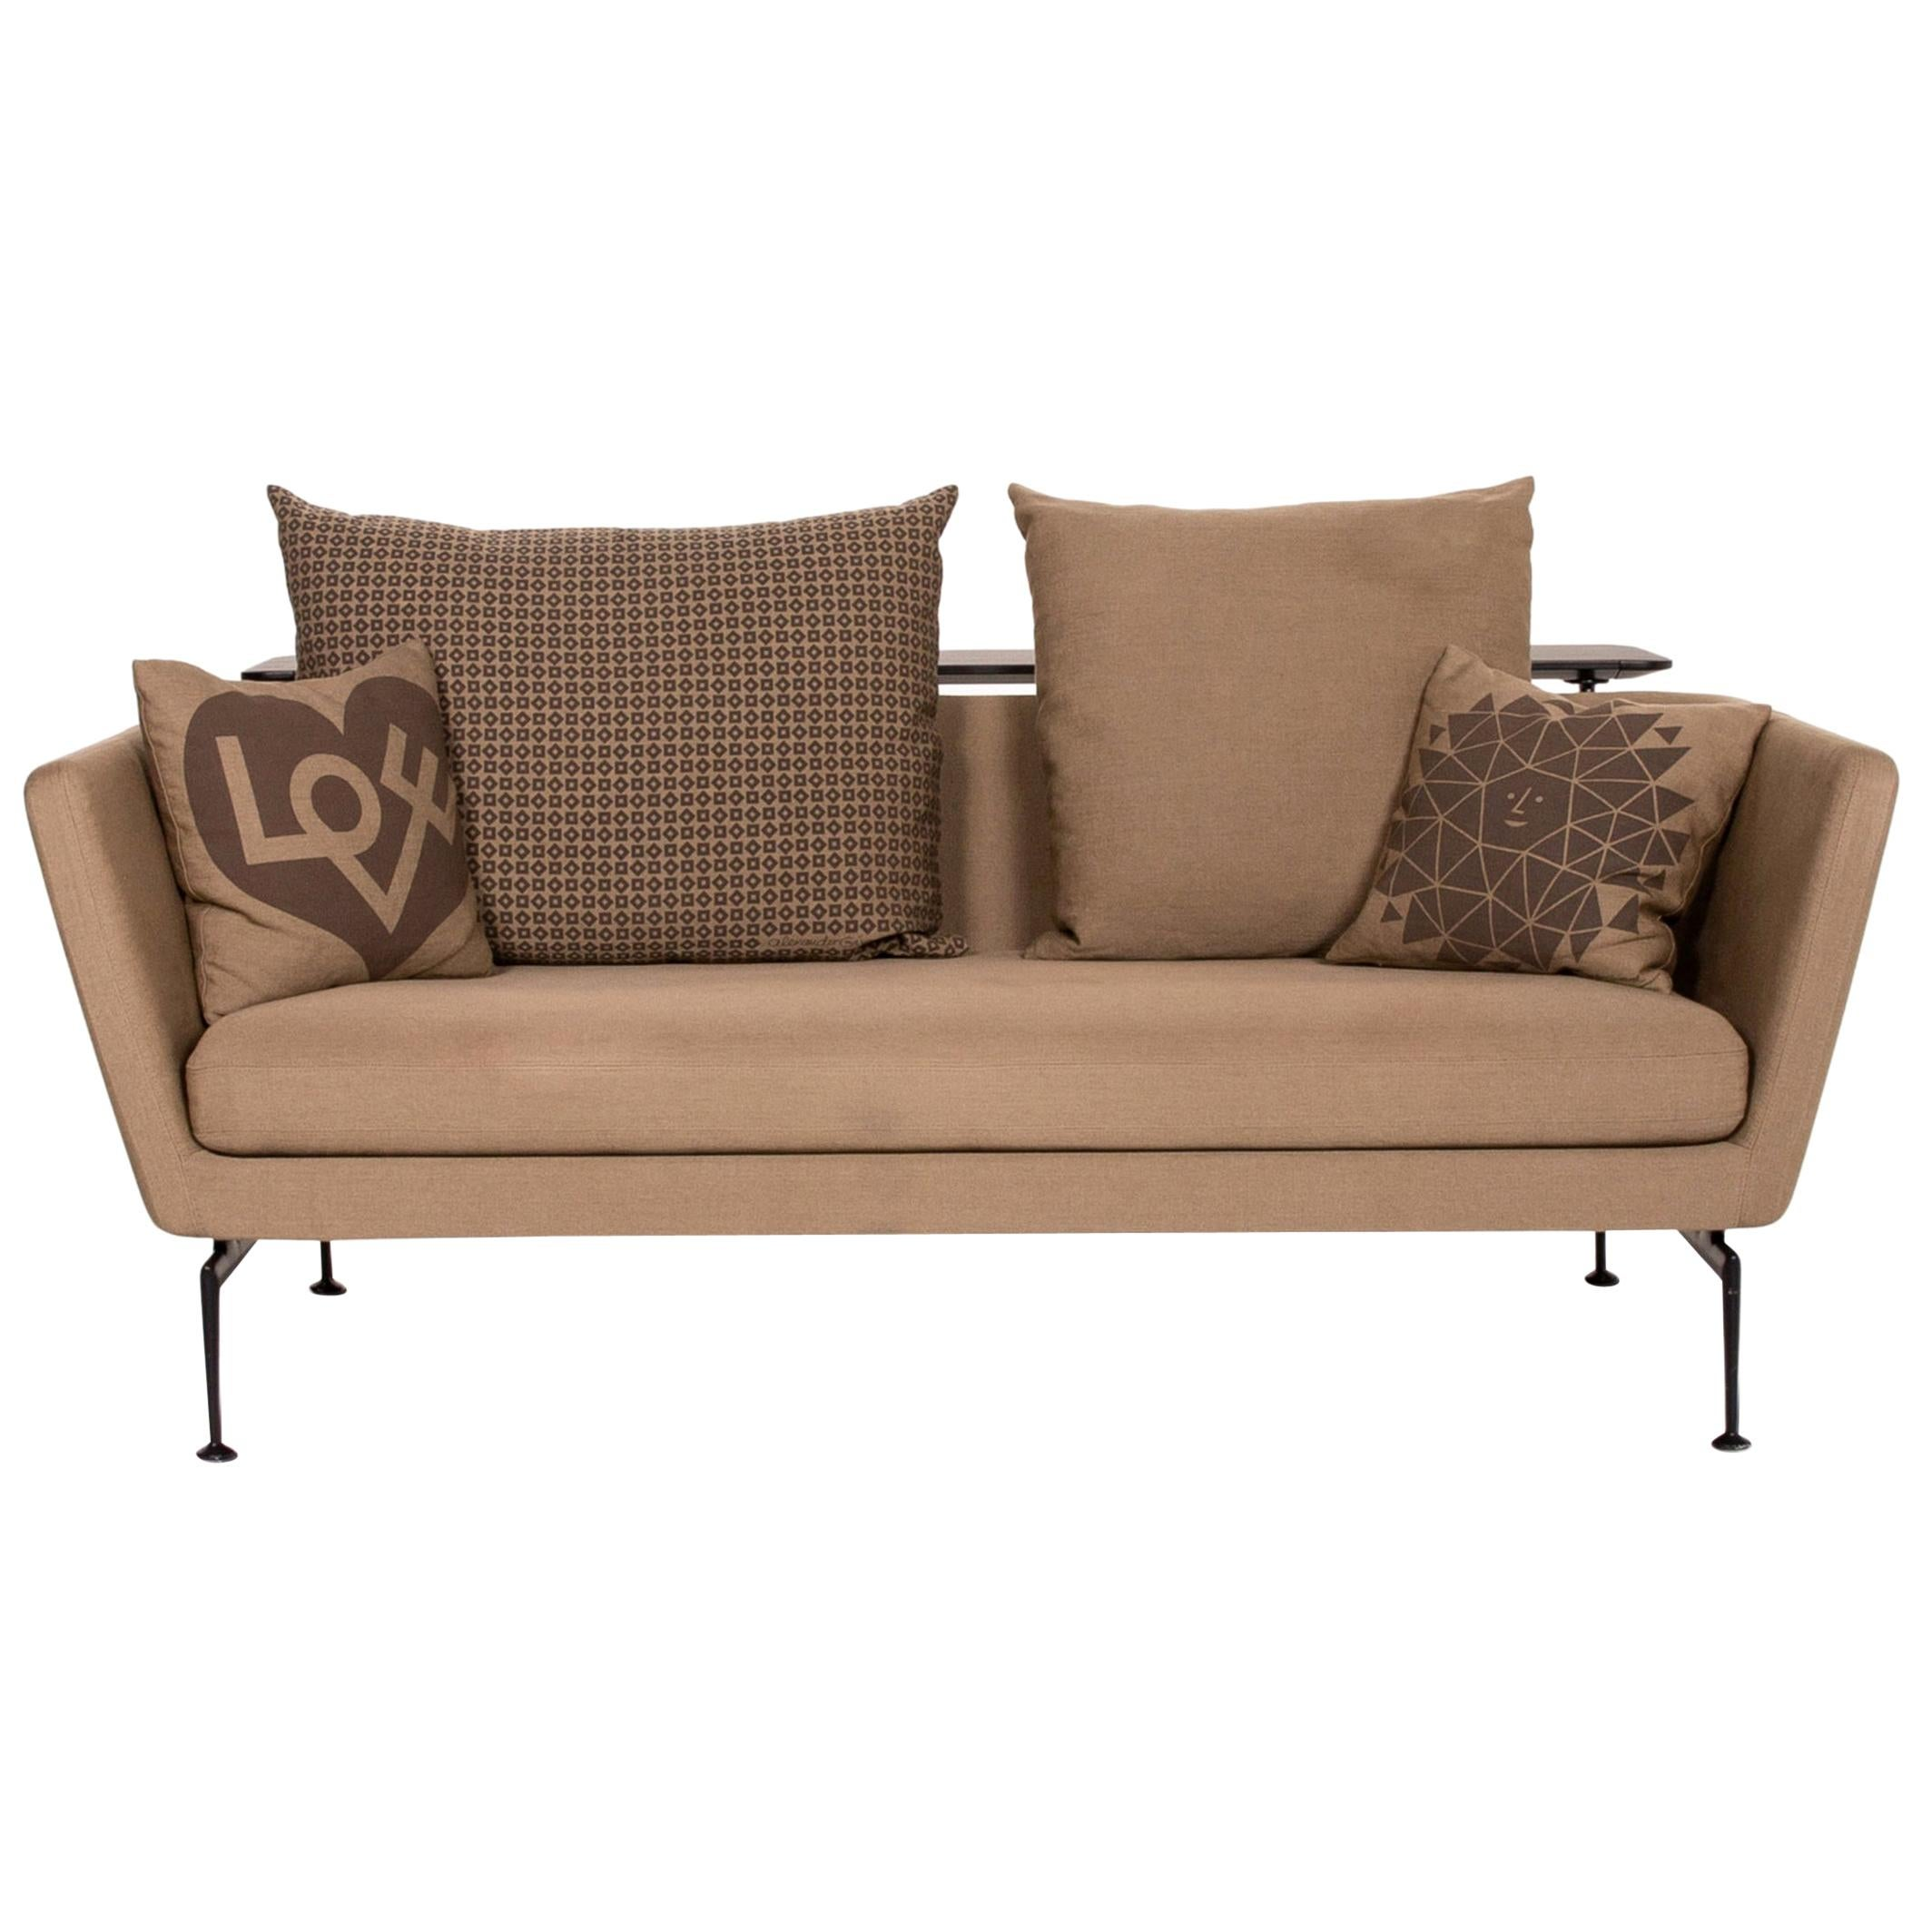 Vitra Suita Fabric Sofa Brown Light Brown Ocher Two-Seat Antonio Citterio